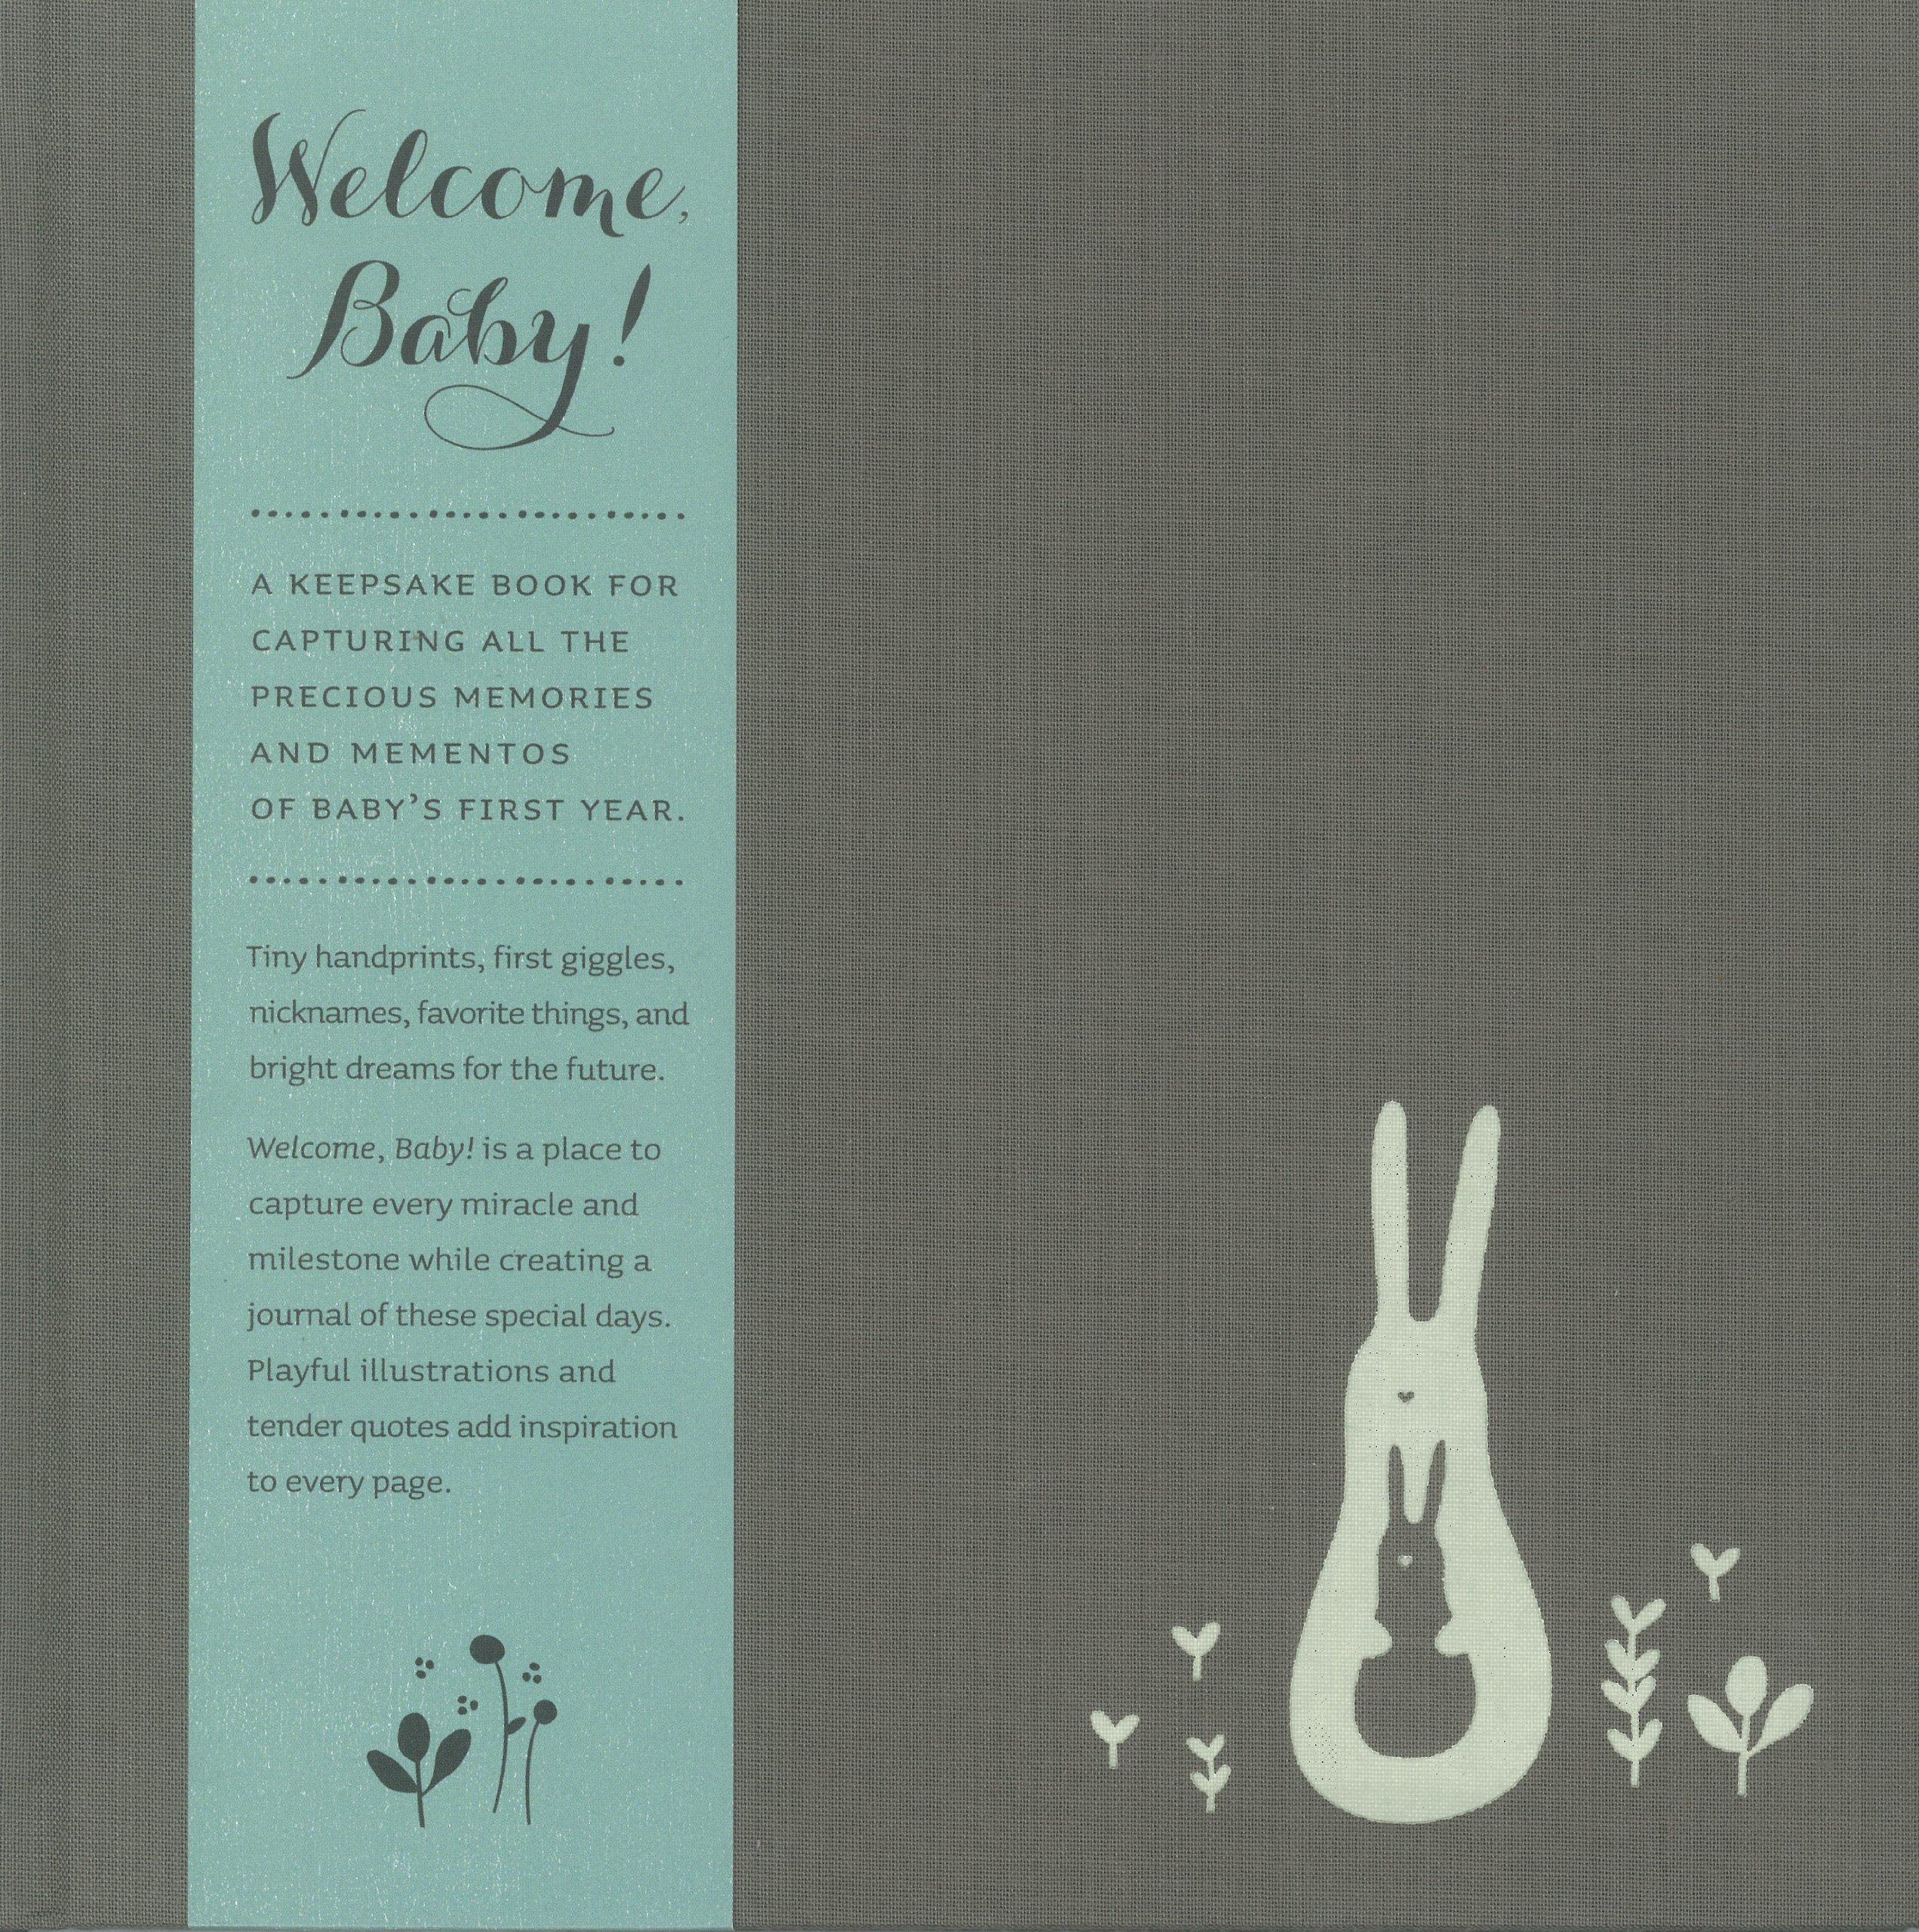 Welcome Baby Aqua Bellyband Edition Dan Zadra 9781935414643